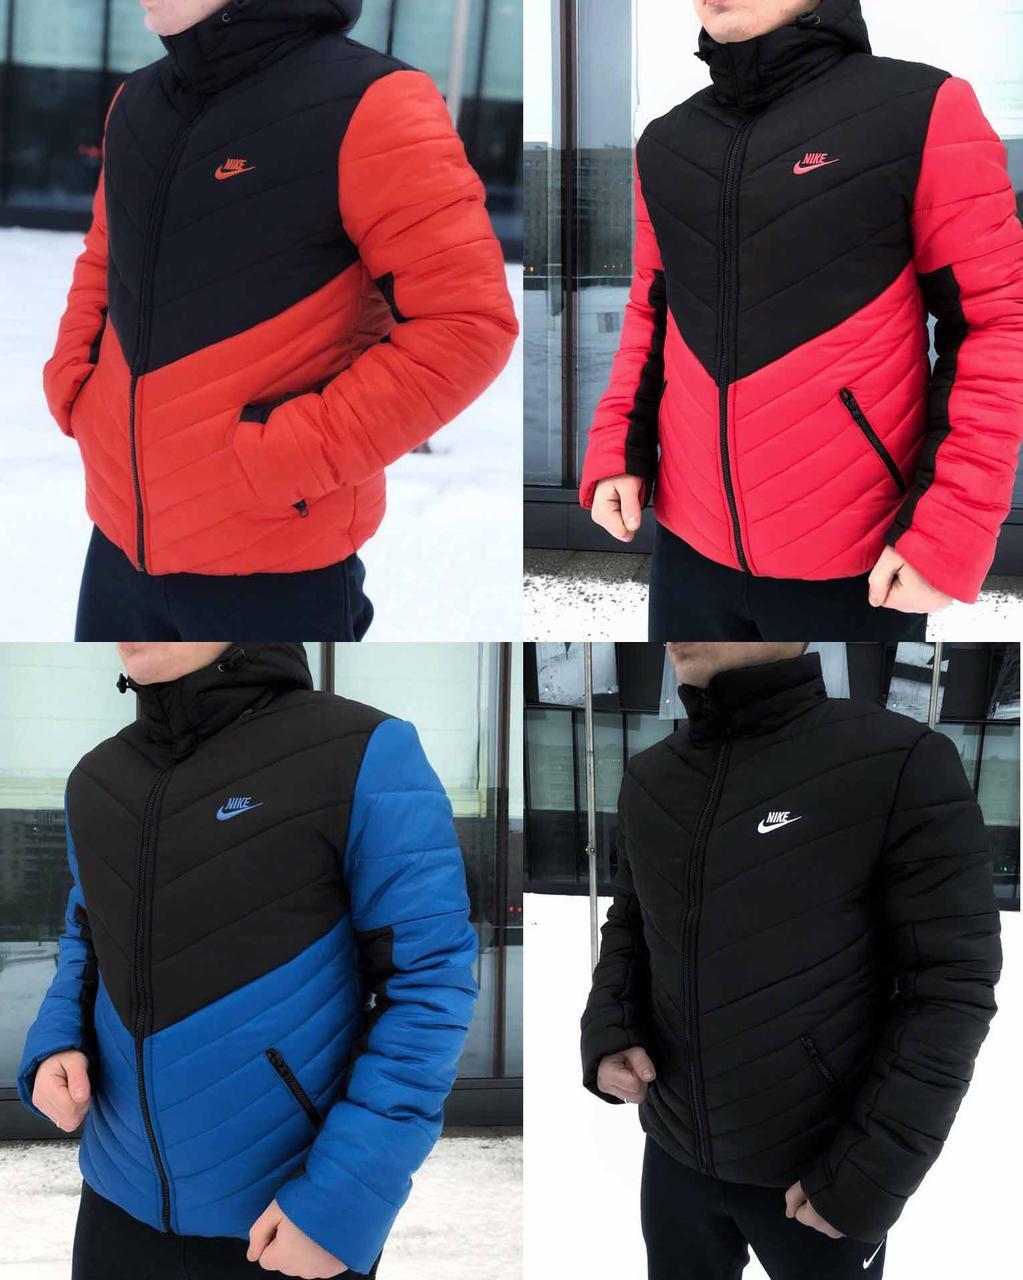 18f91423 Мужская зимняя куртка/пуховик в стиле Nike 5 цветов в наличии -  Интернет-магазин